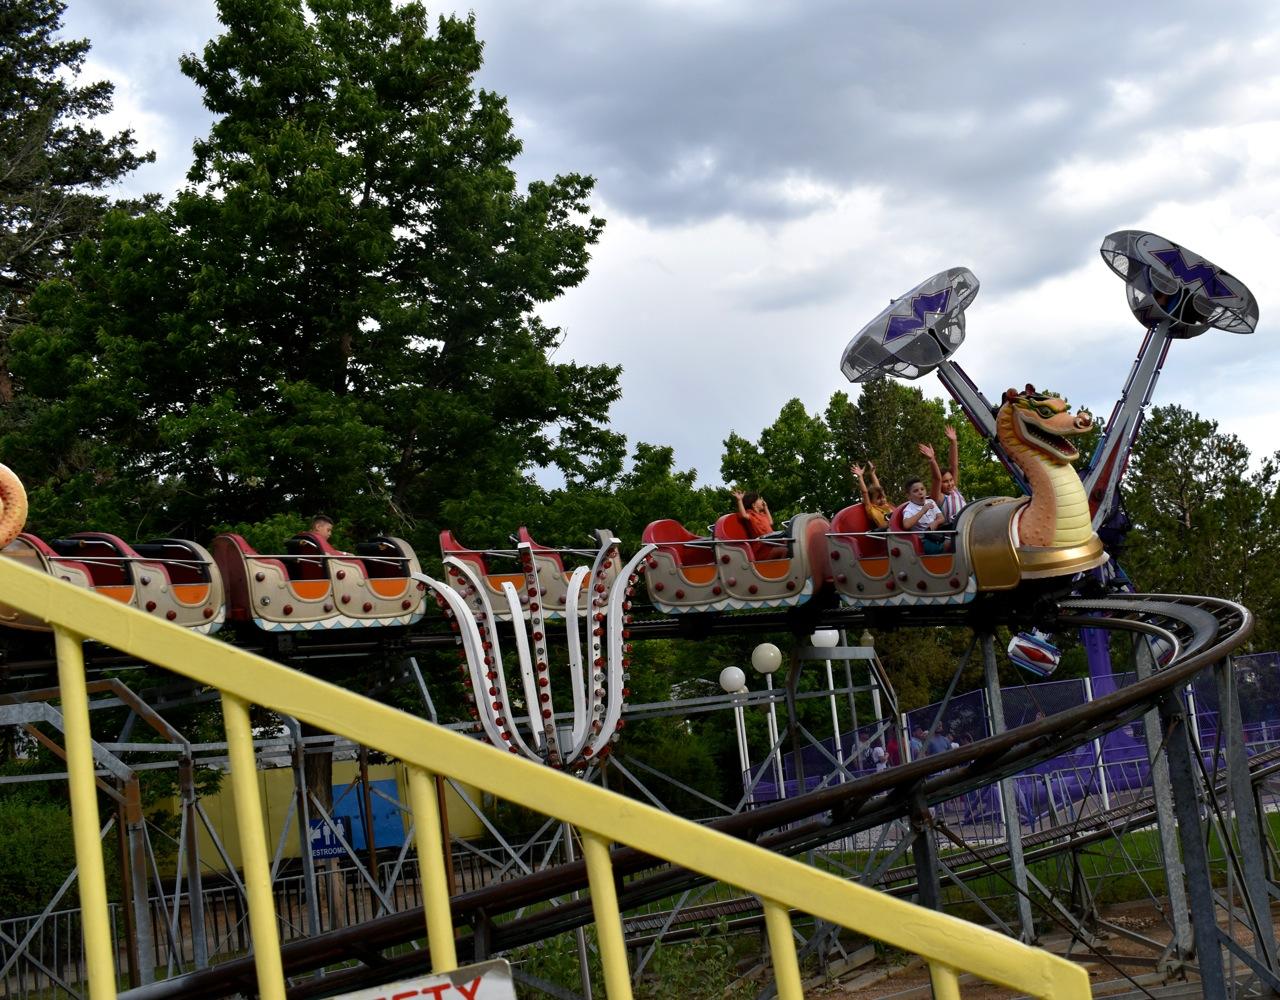 Lakeside Amusement Park Denver July 2019 37.jpg